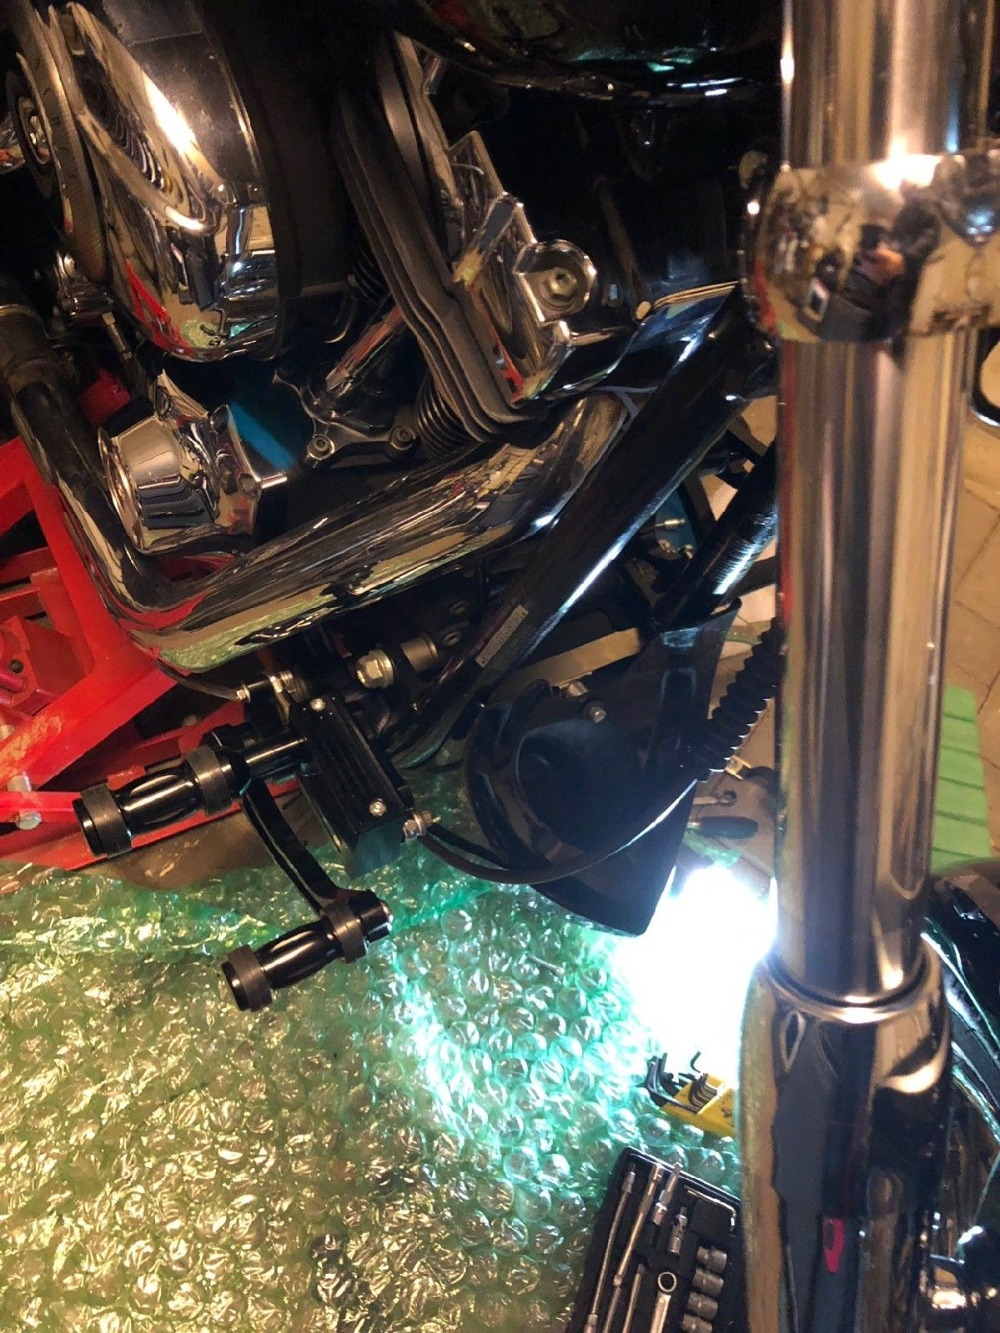 BIKINGBOY CNC Billet Forward Controls Foot Rests Foot Rest Rearsets for Harley Davidson SOFTAIL 01 02 03 04 05 06 07 08 09 10-16